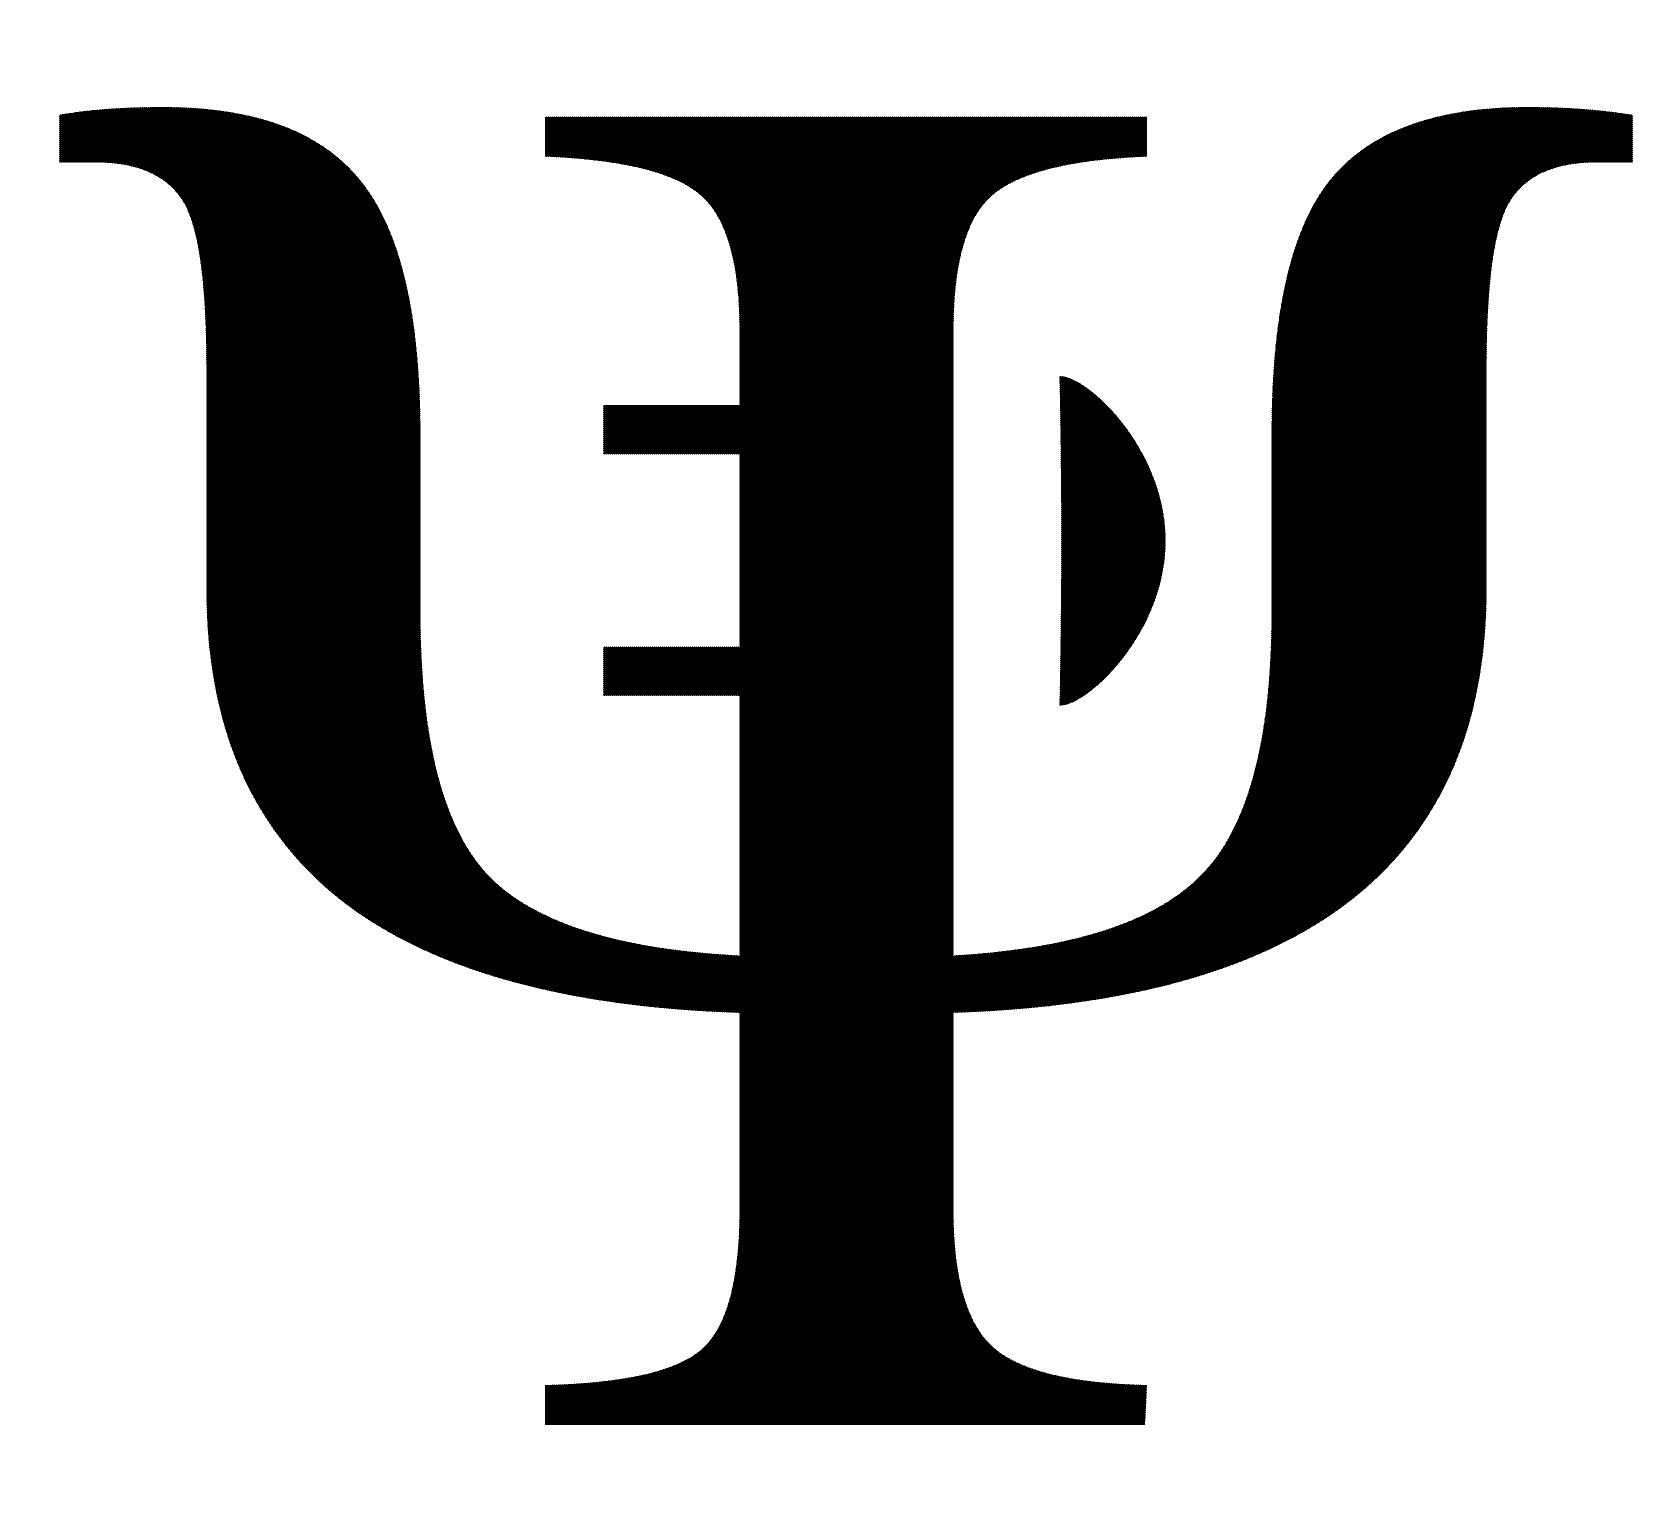 Ed Psy 2 Practice